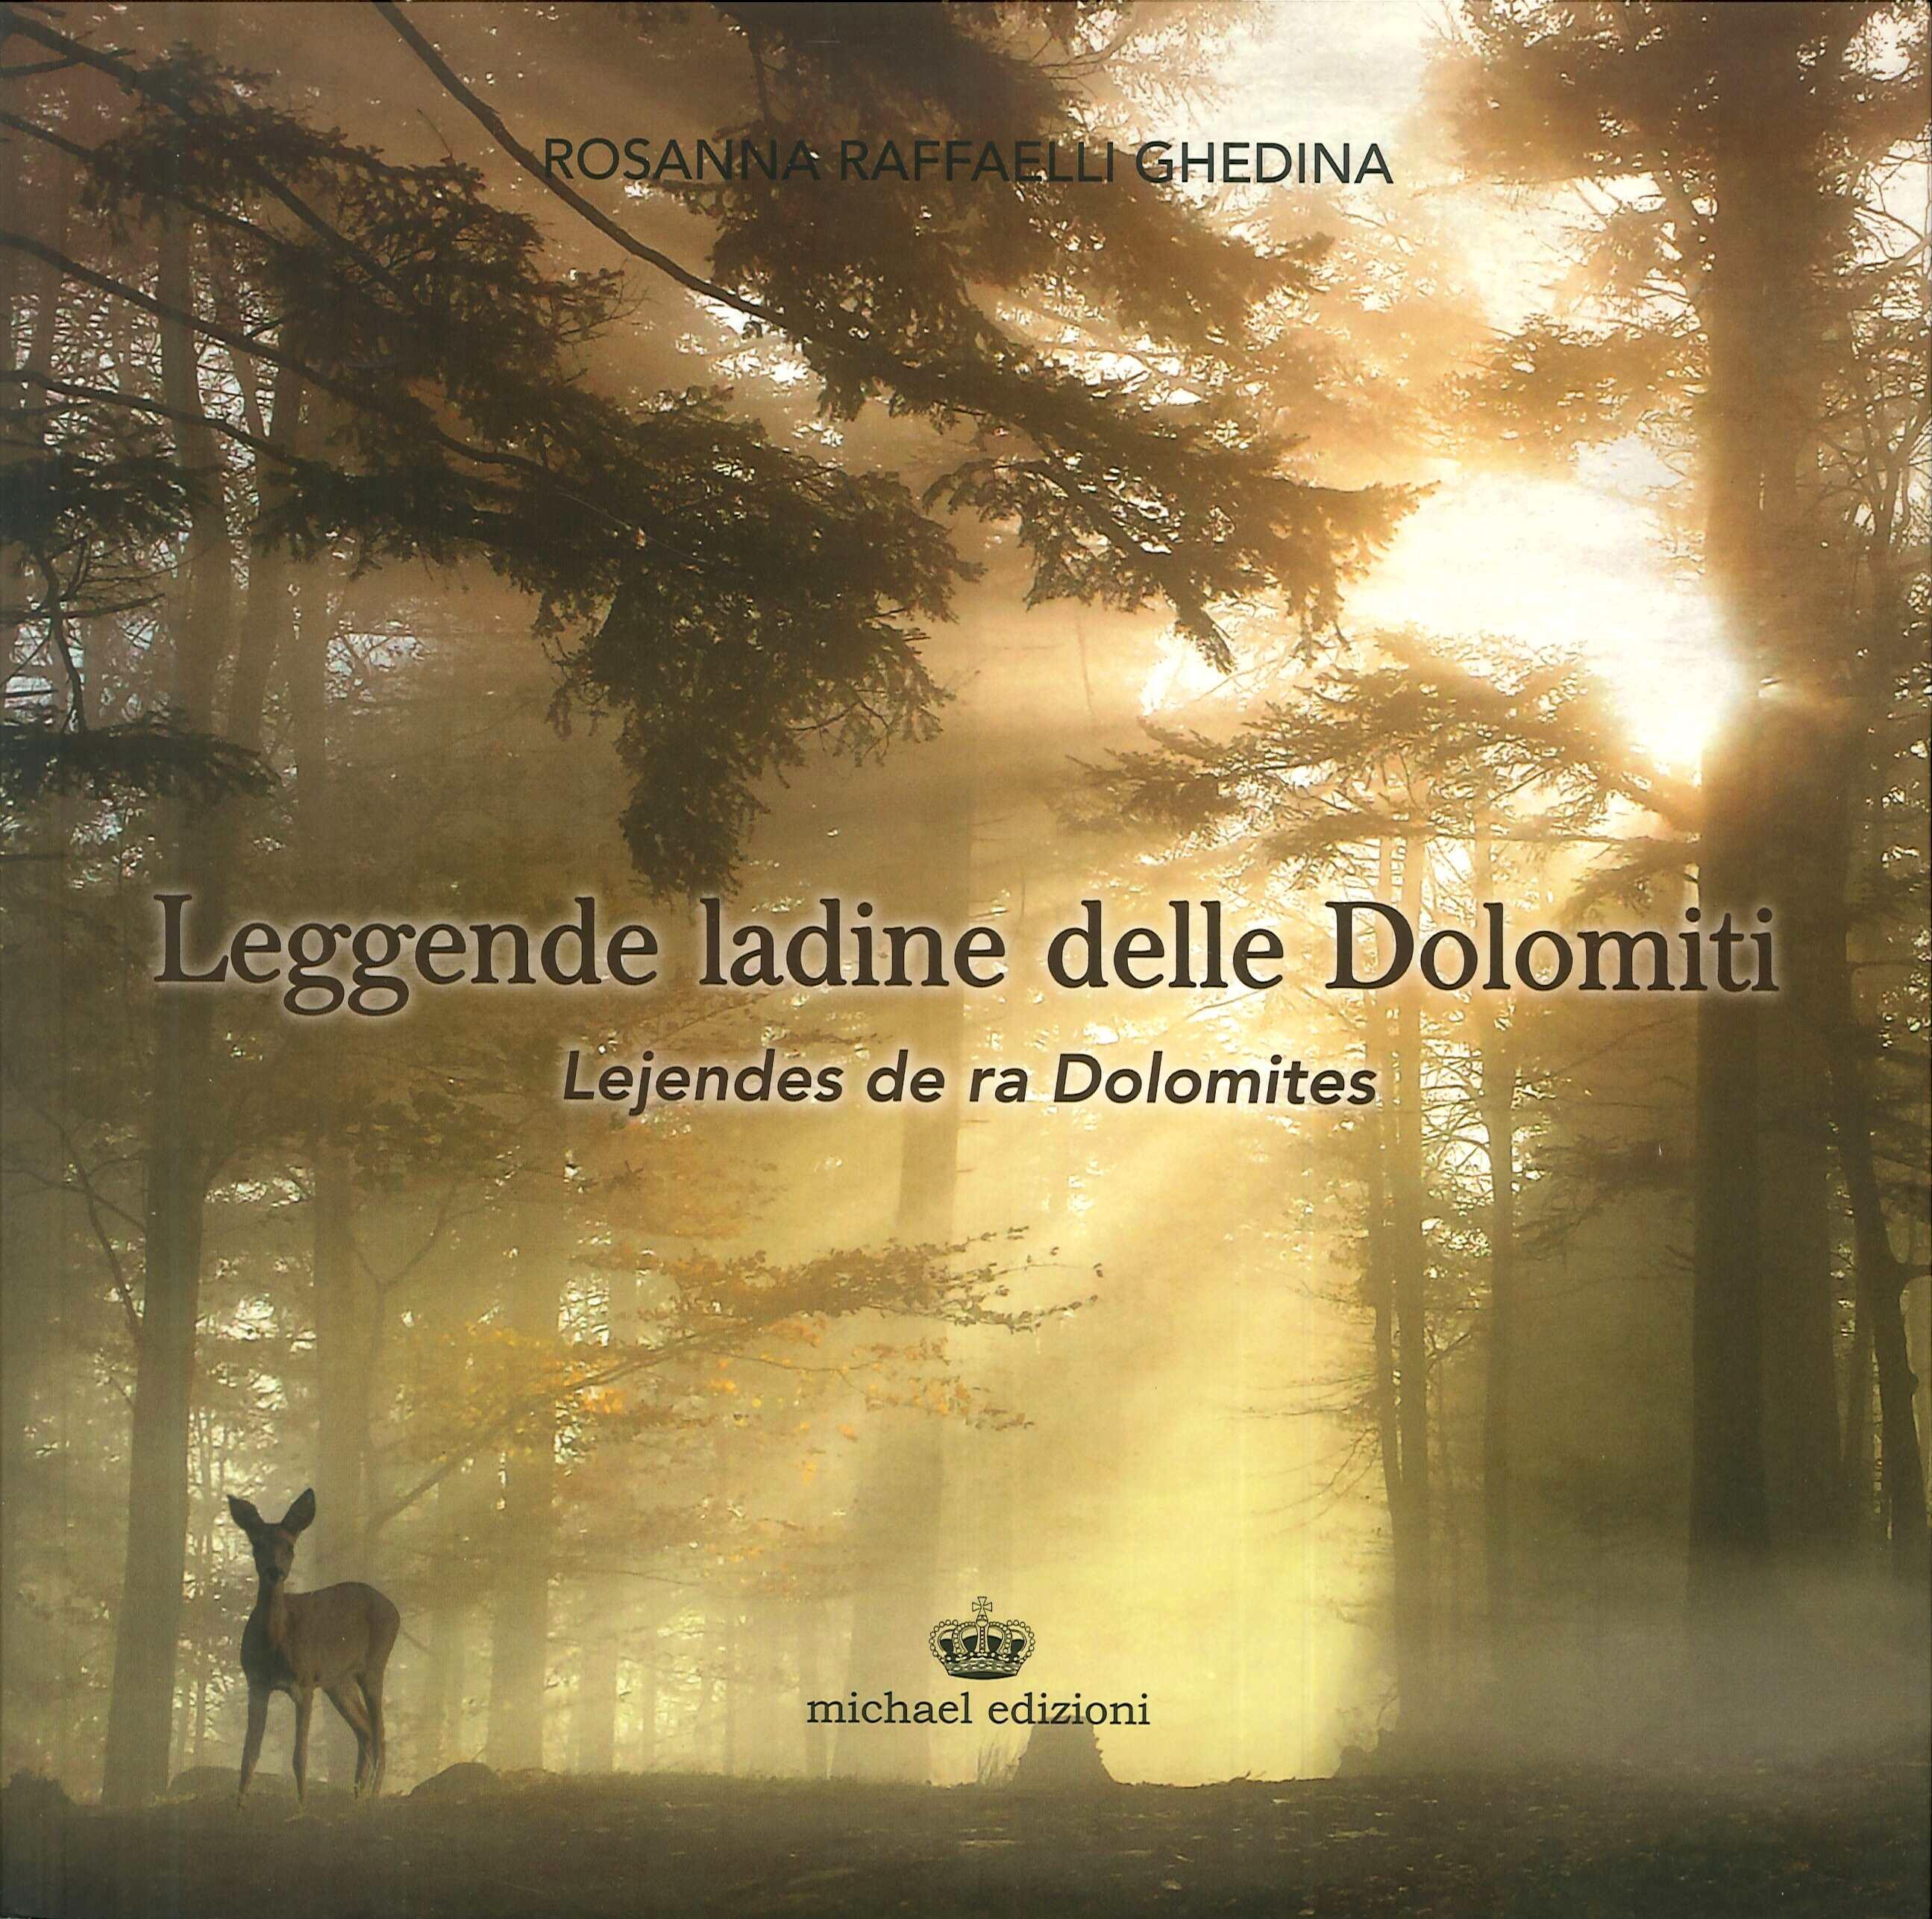 Leggende ladine delle Dolomiti. Lejendes de ra Dolomites